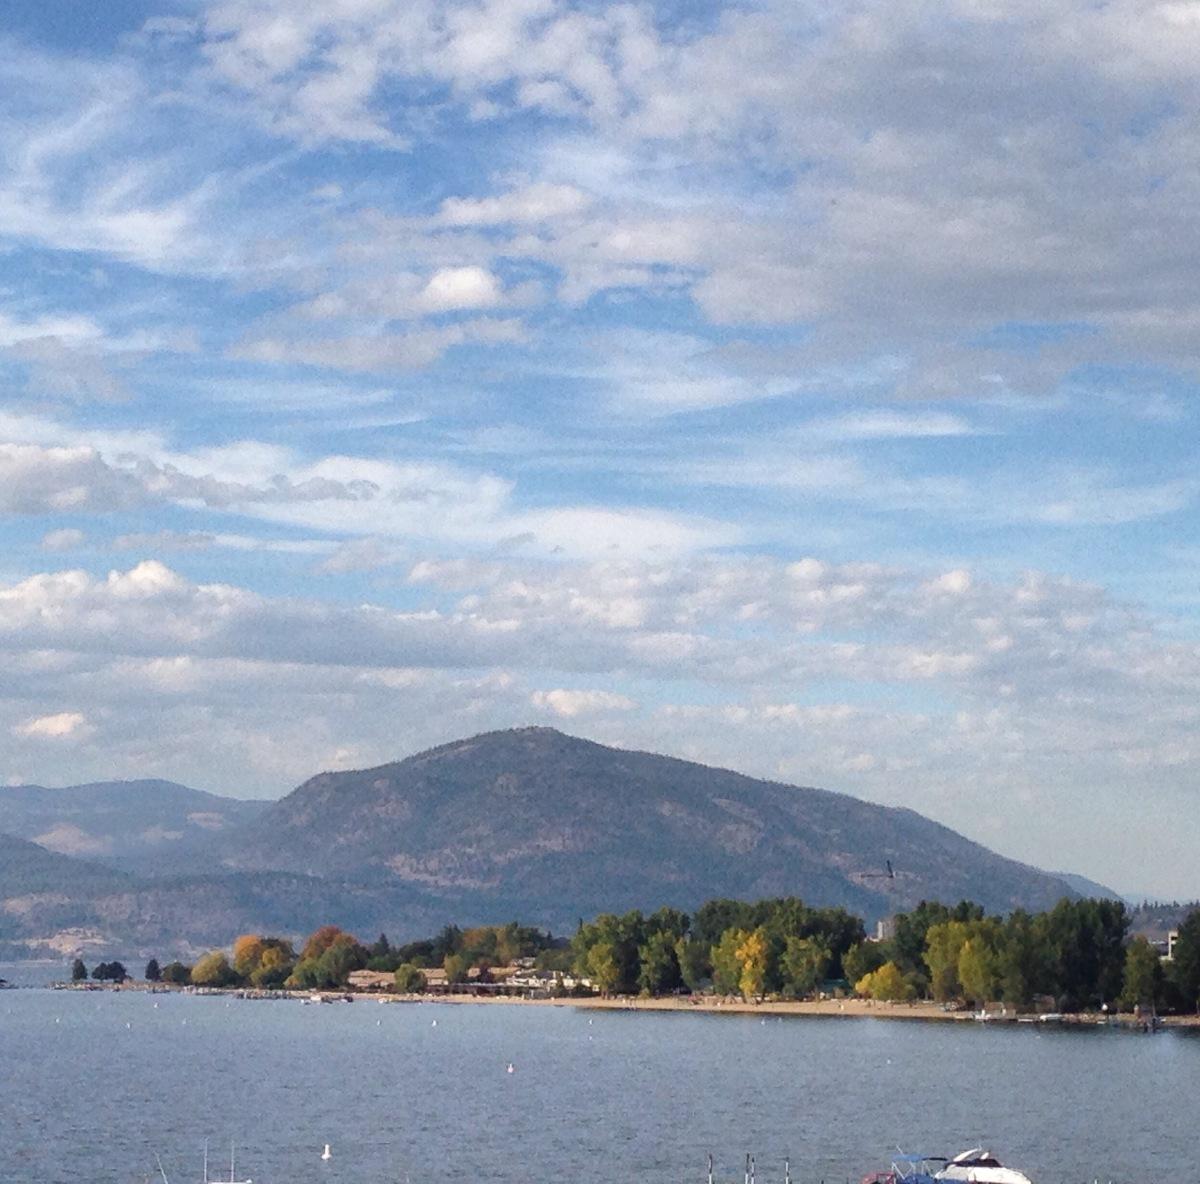 Hotel Eldorado: A Lakefront Postcard from Kelowna